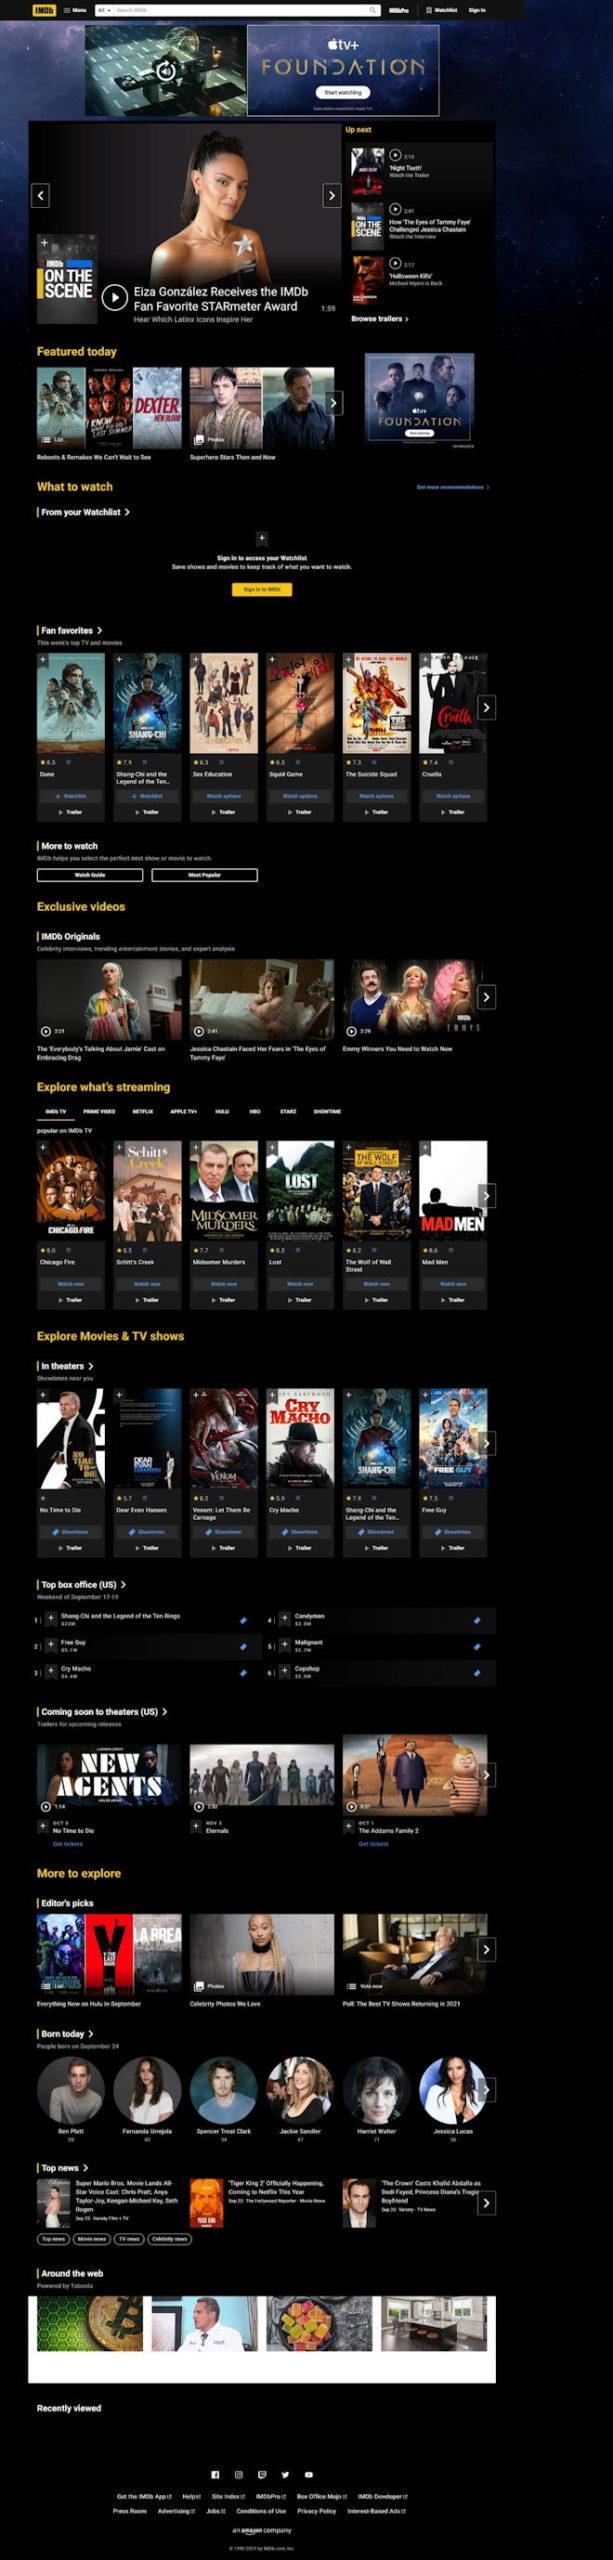 imdb.com full web page capture